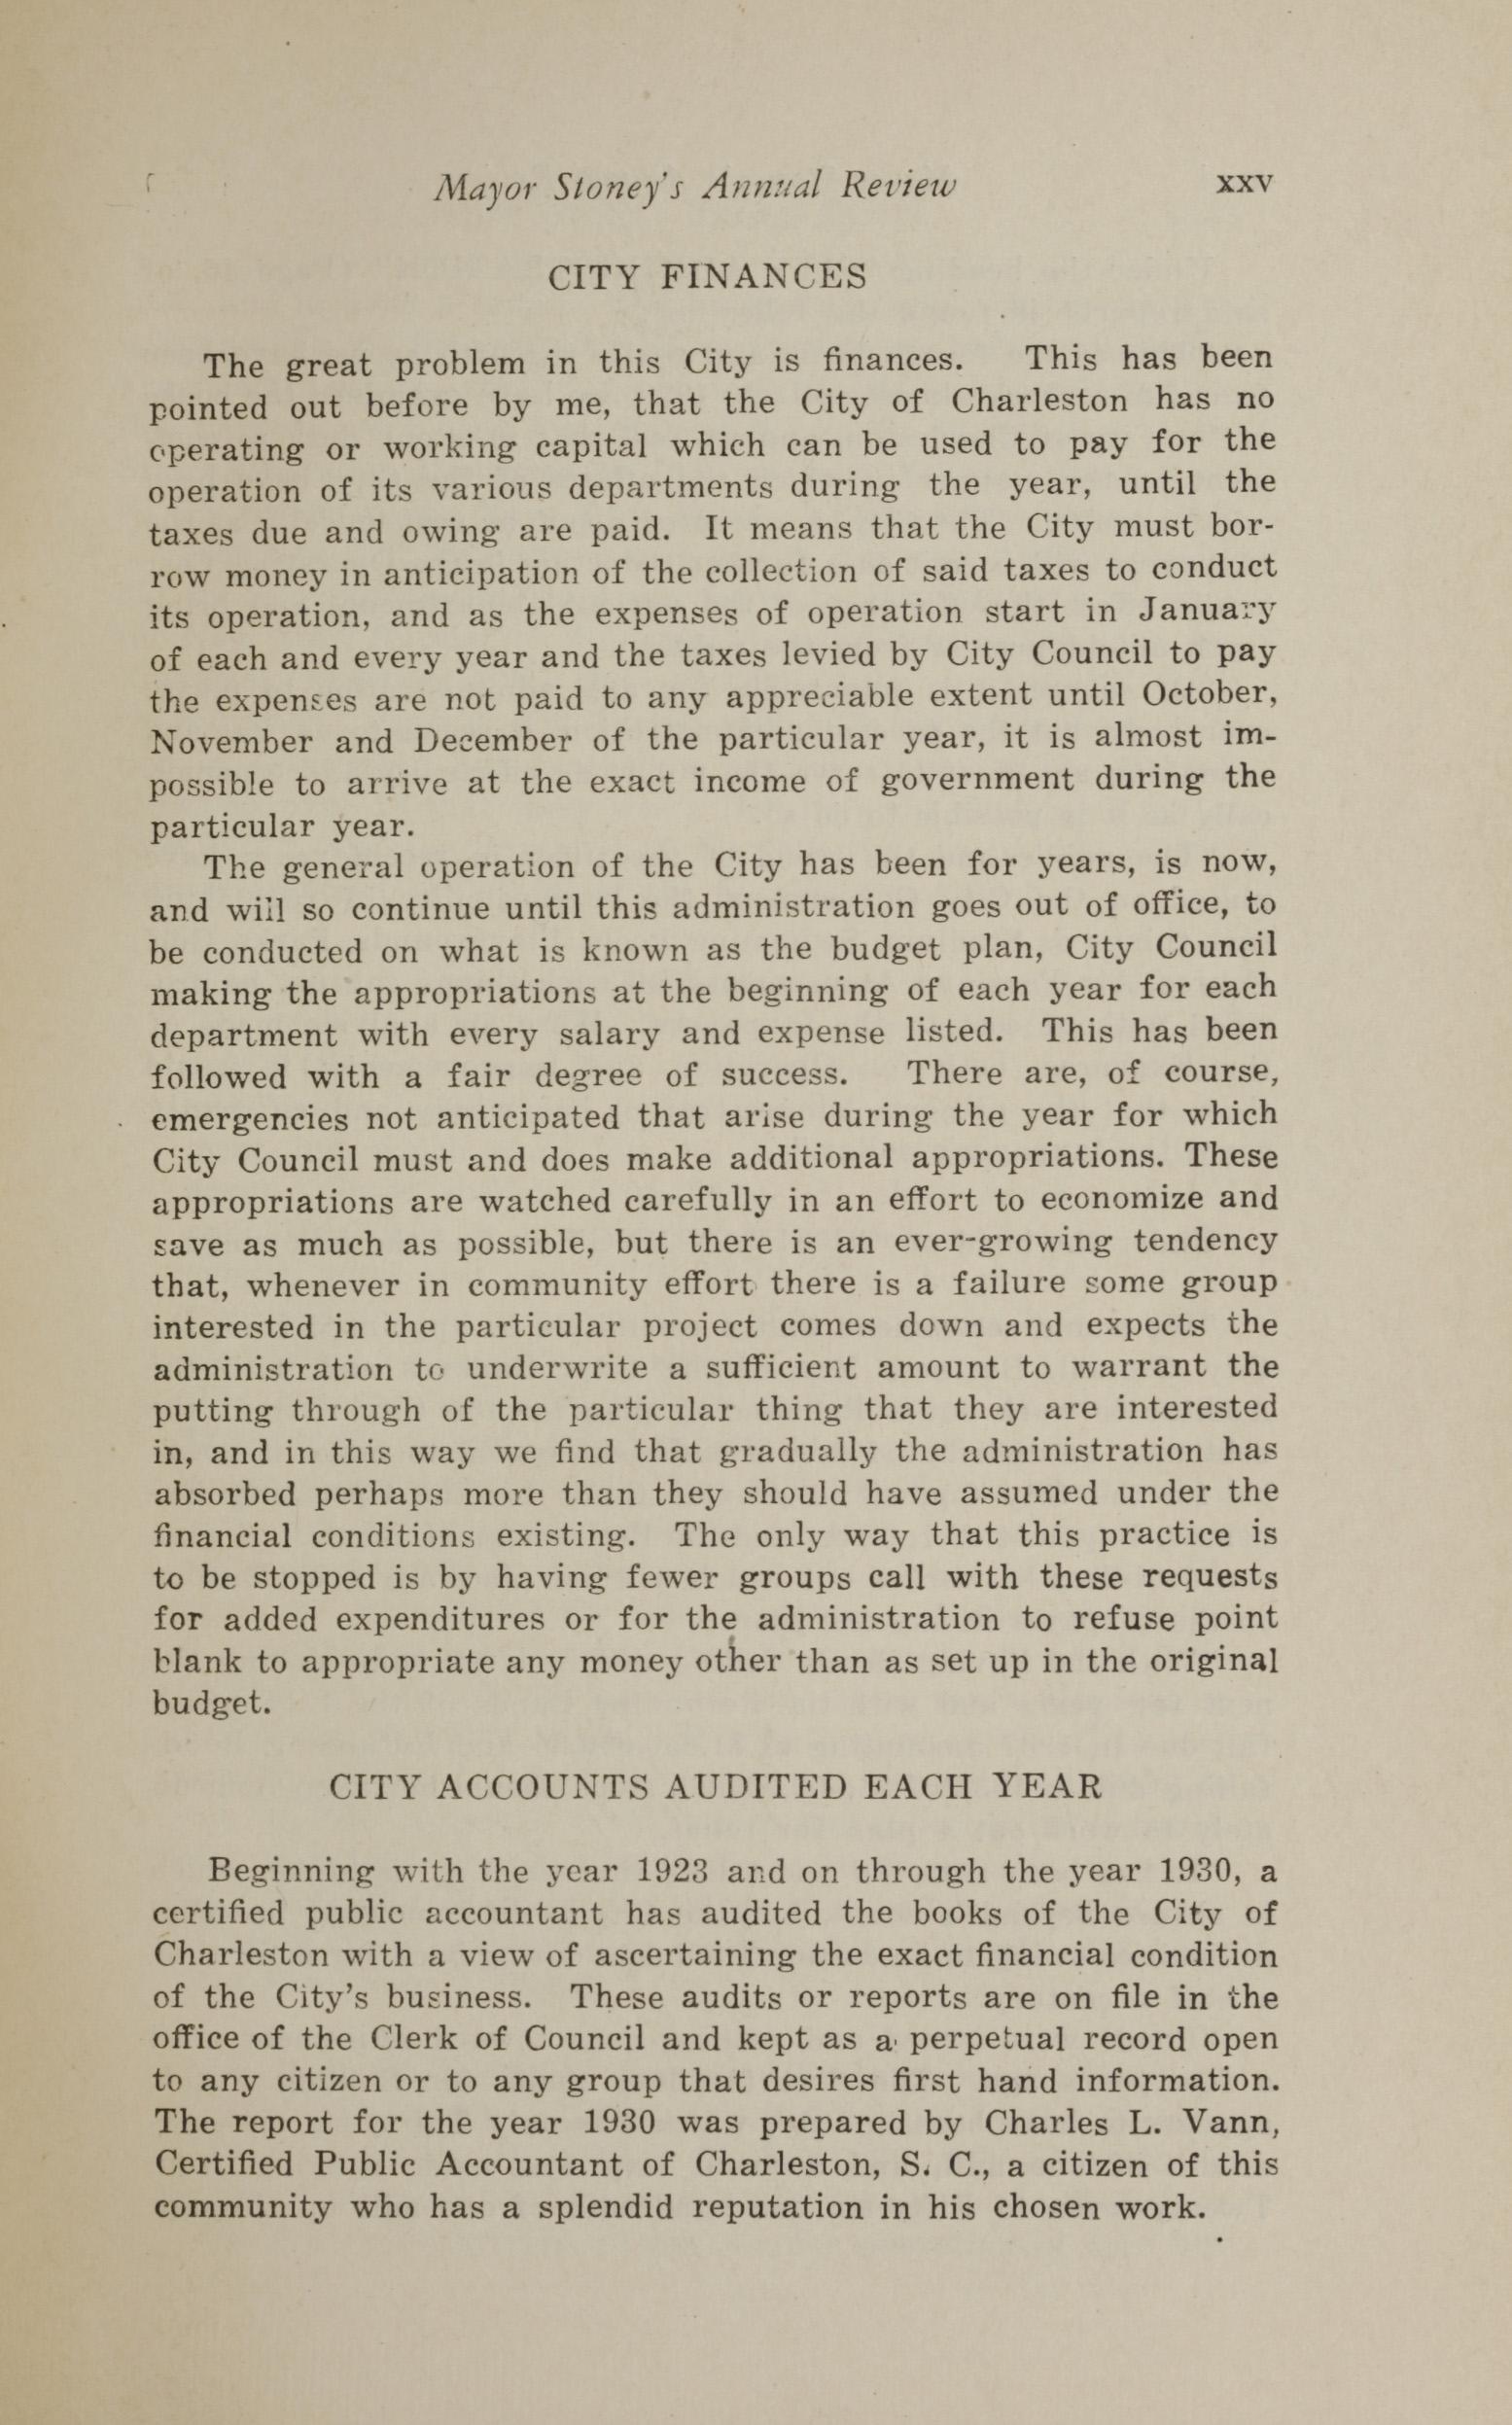 Charleston Yearbook, 1930, page xxv